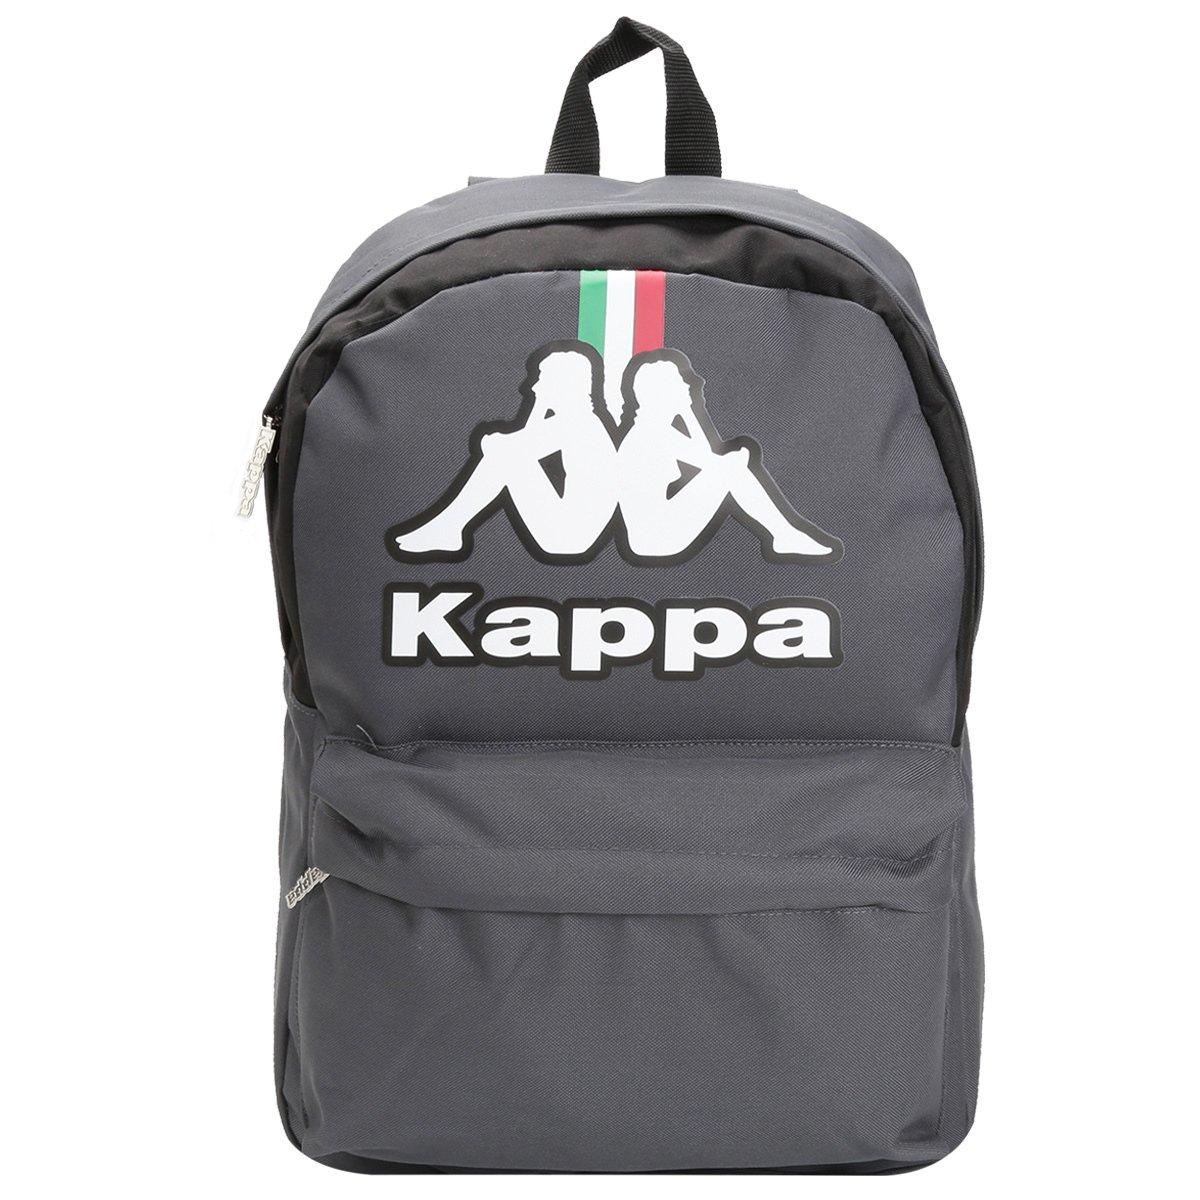 Mochila Kappa Itália Masculina - Compre Agora  6d748885e77